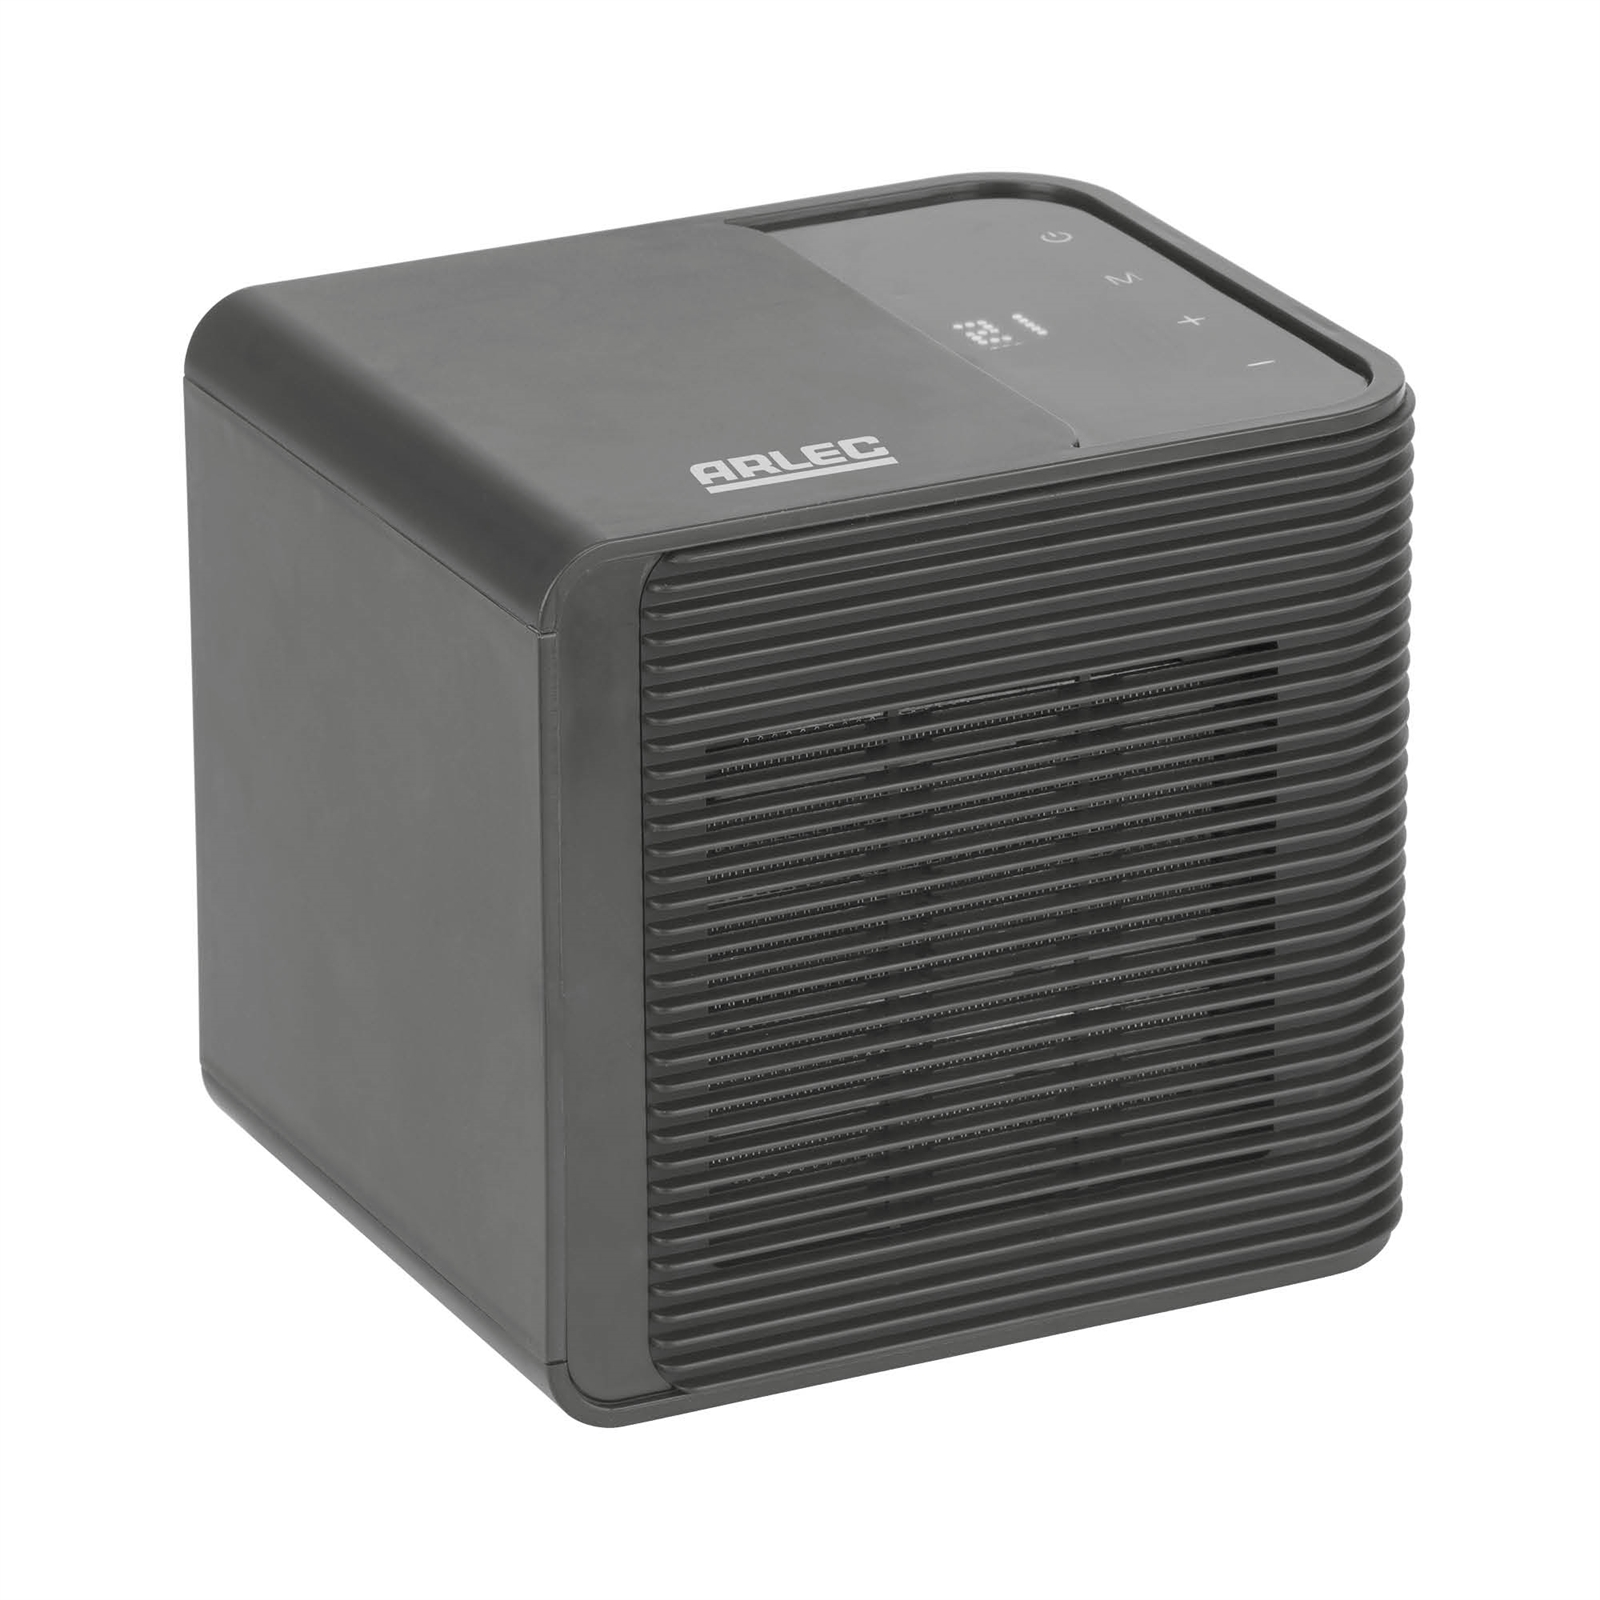 Arlec 2000W Ceramic Heater